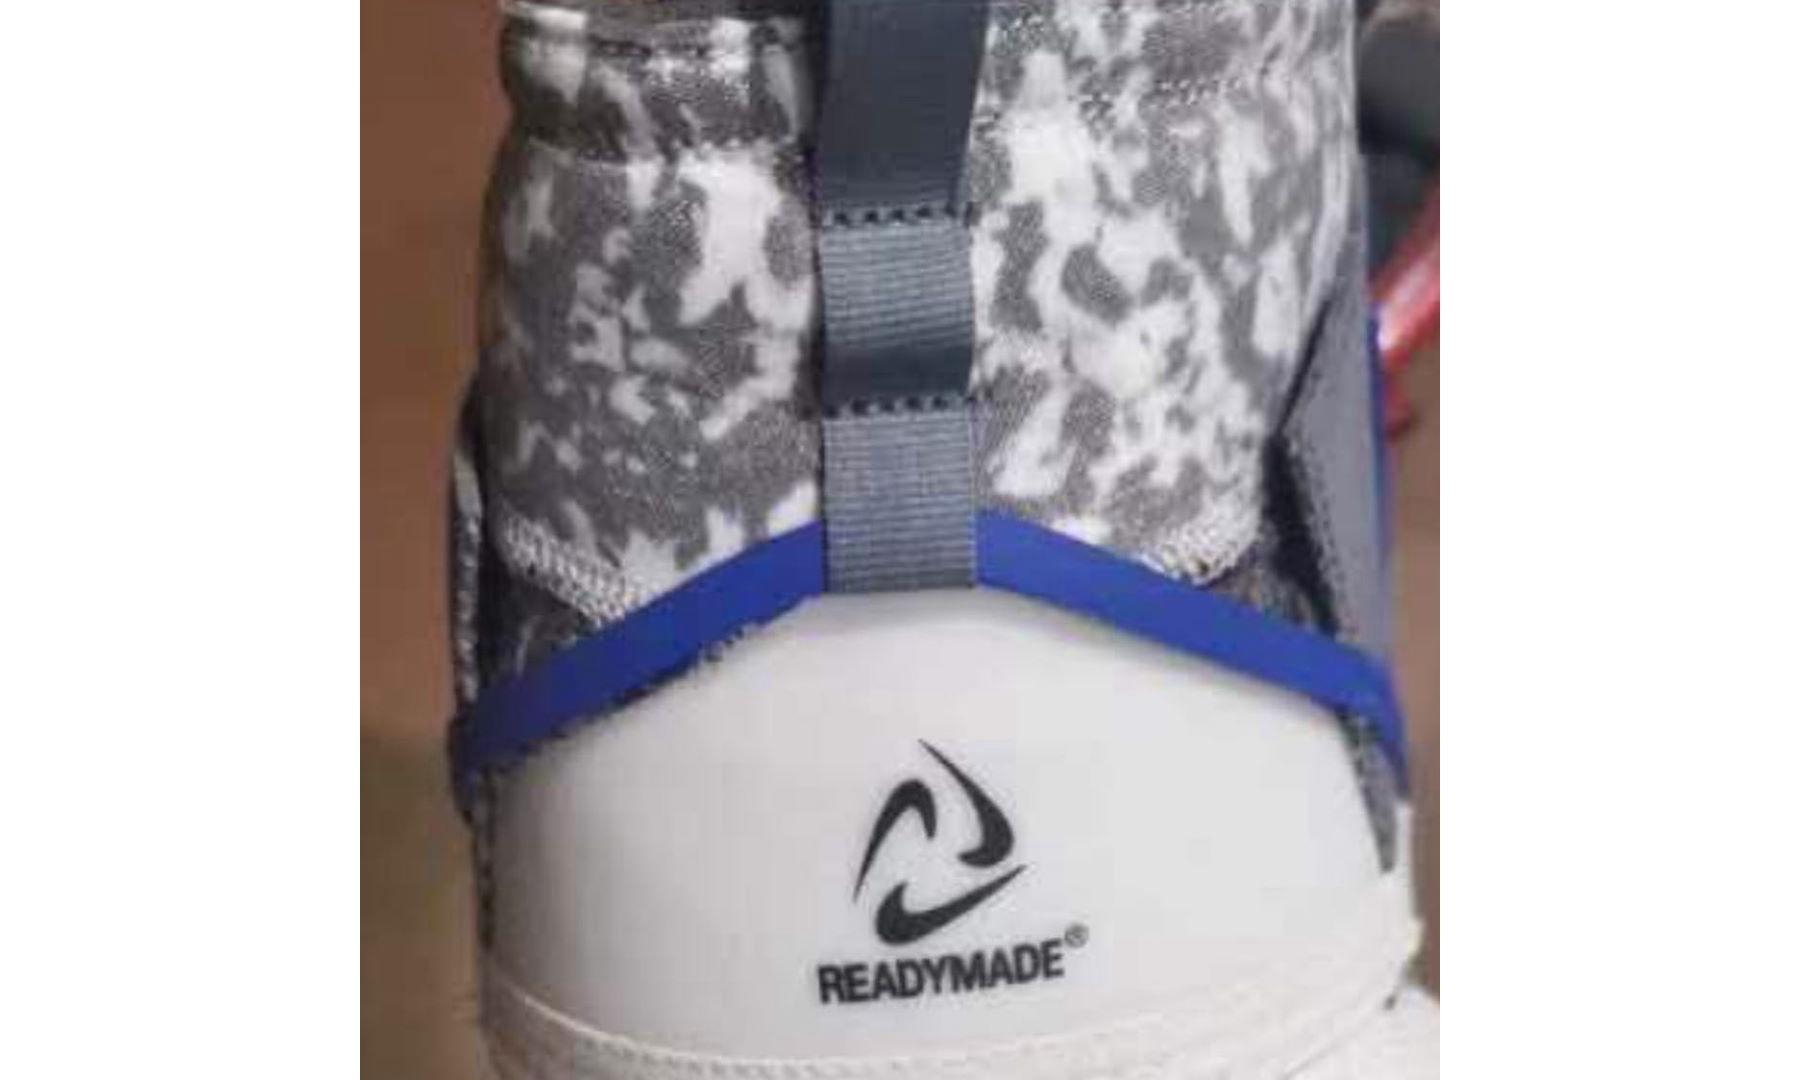 READYMADE x Nike 联乘设计首度曝光